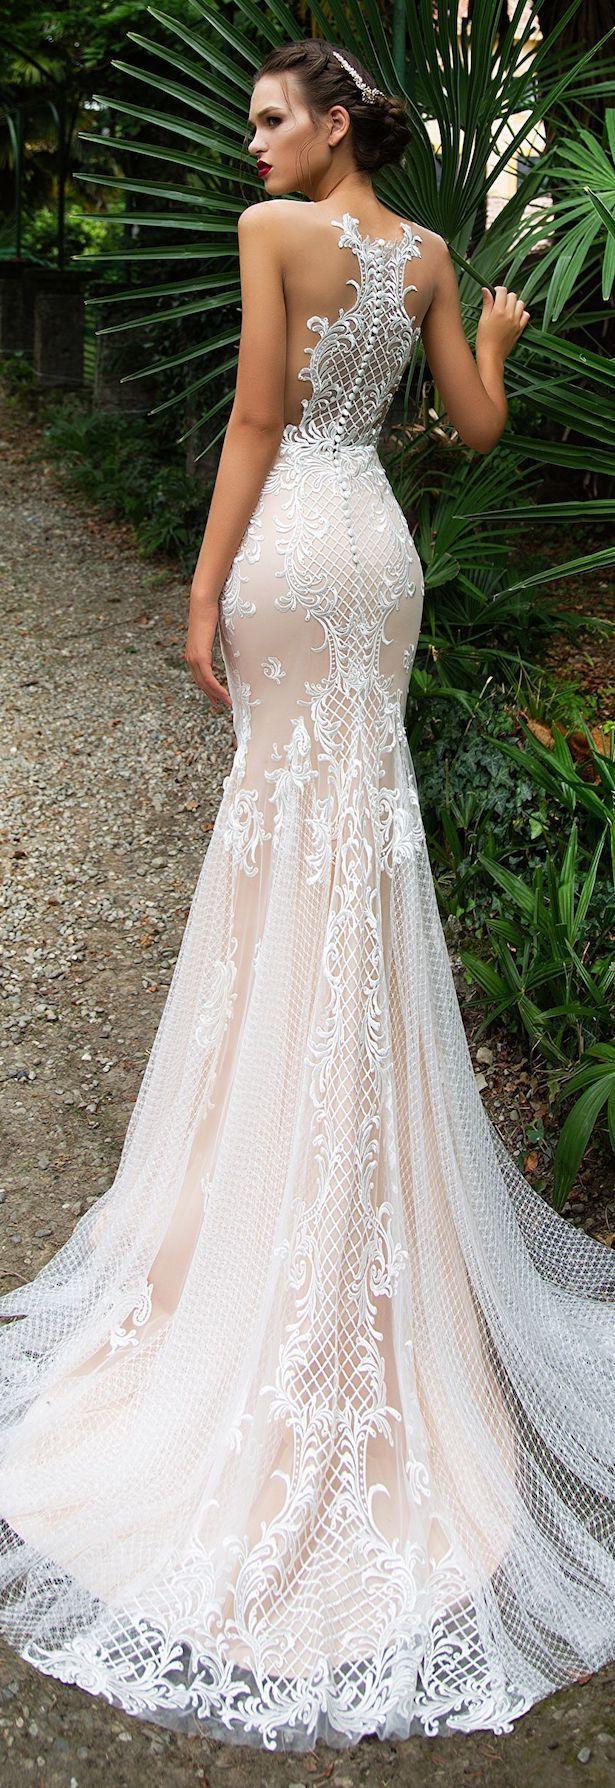 Best 25+ Unique wedding dress ideas on Pinterest   Fashion ...